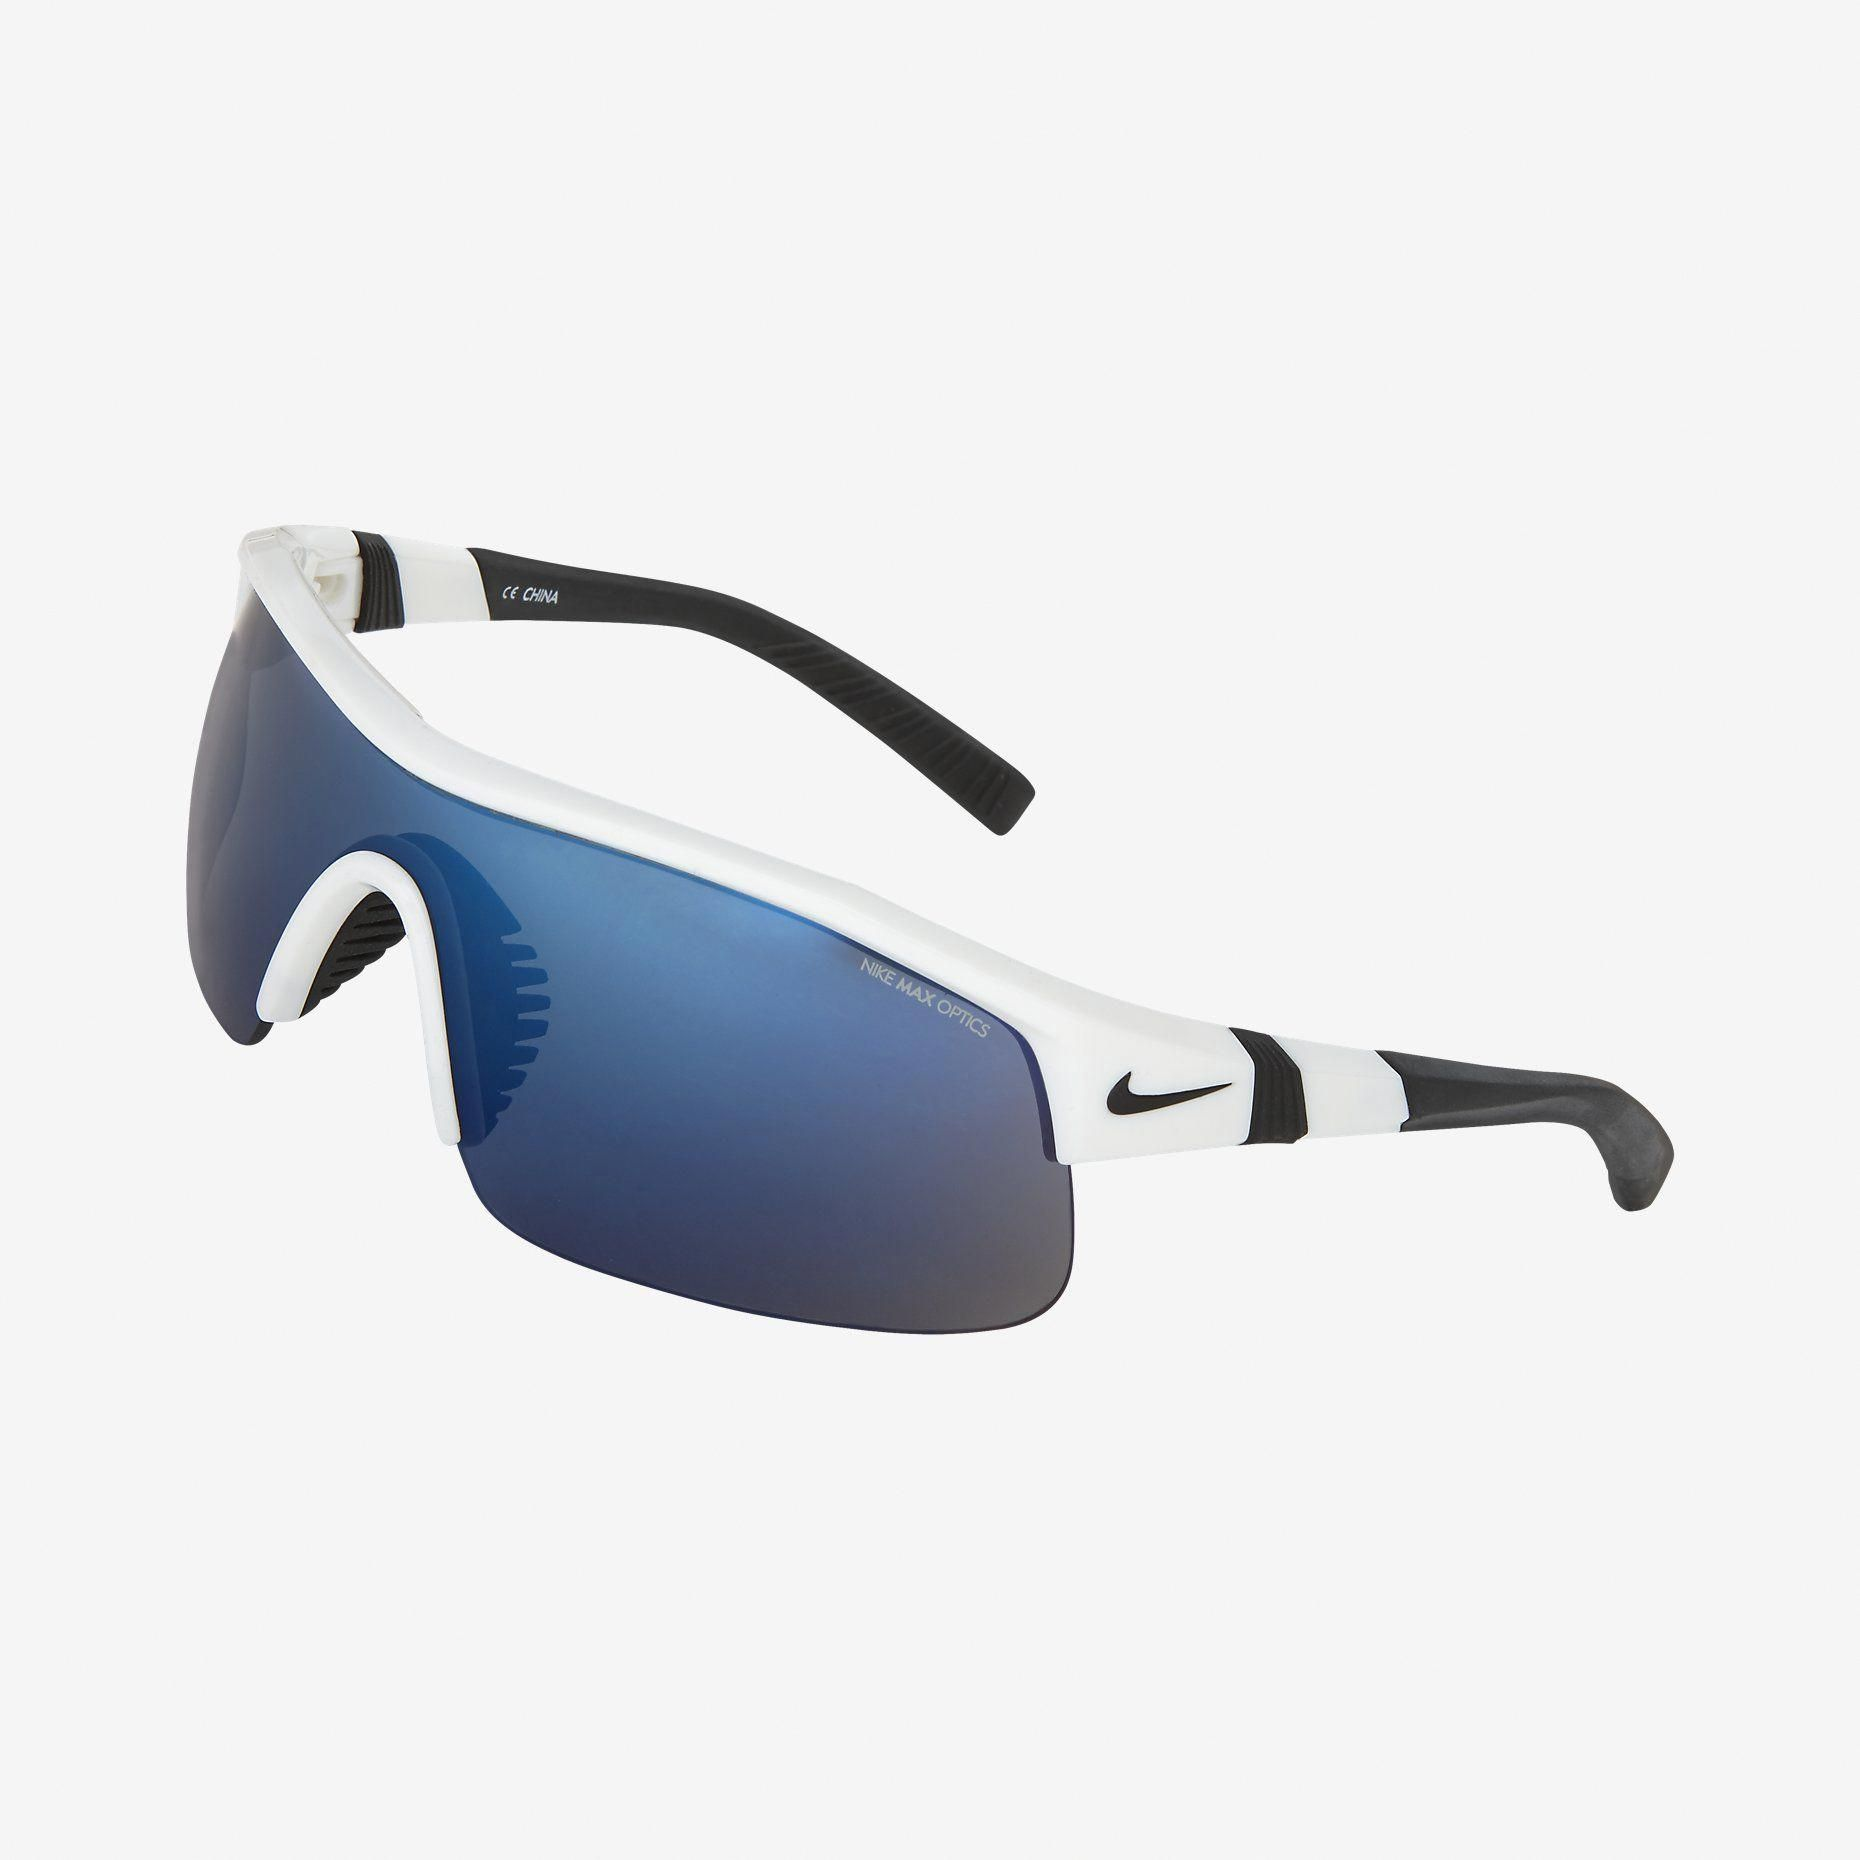 6b8eda45043 Nike Show X1 Team Sunglasses. Nike Store  baseballsunglasses ...